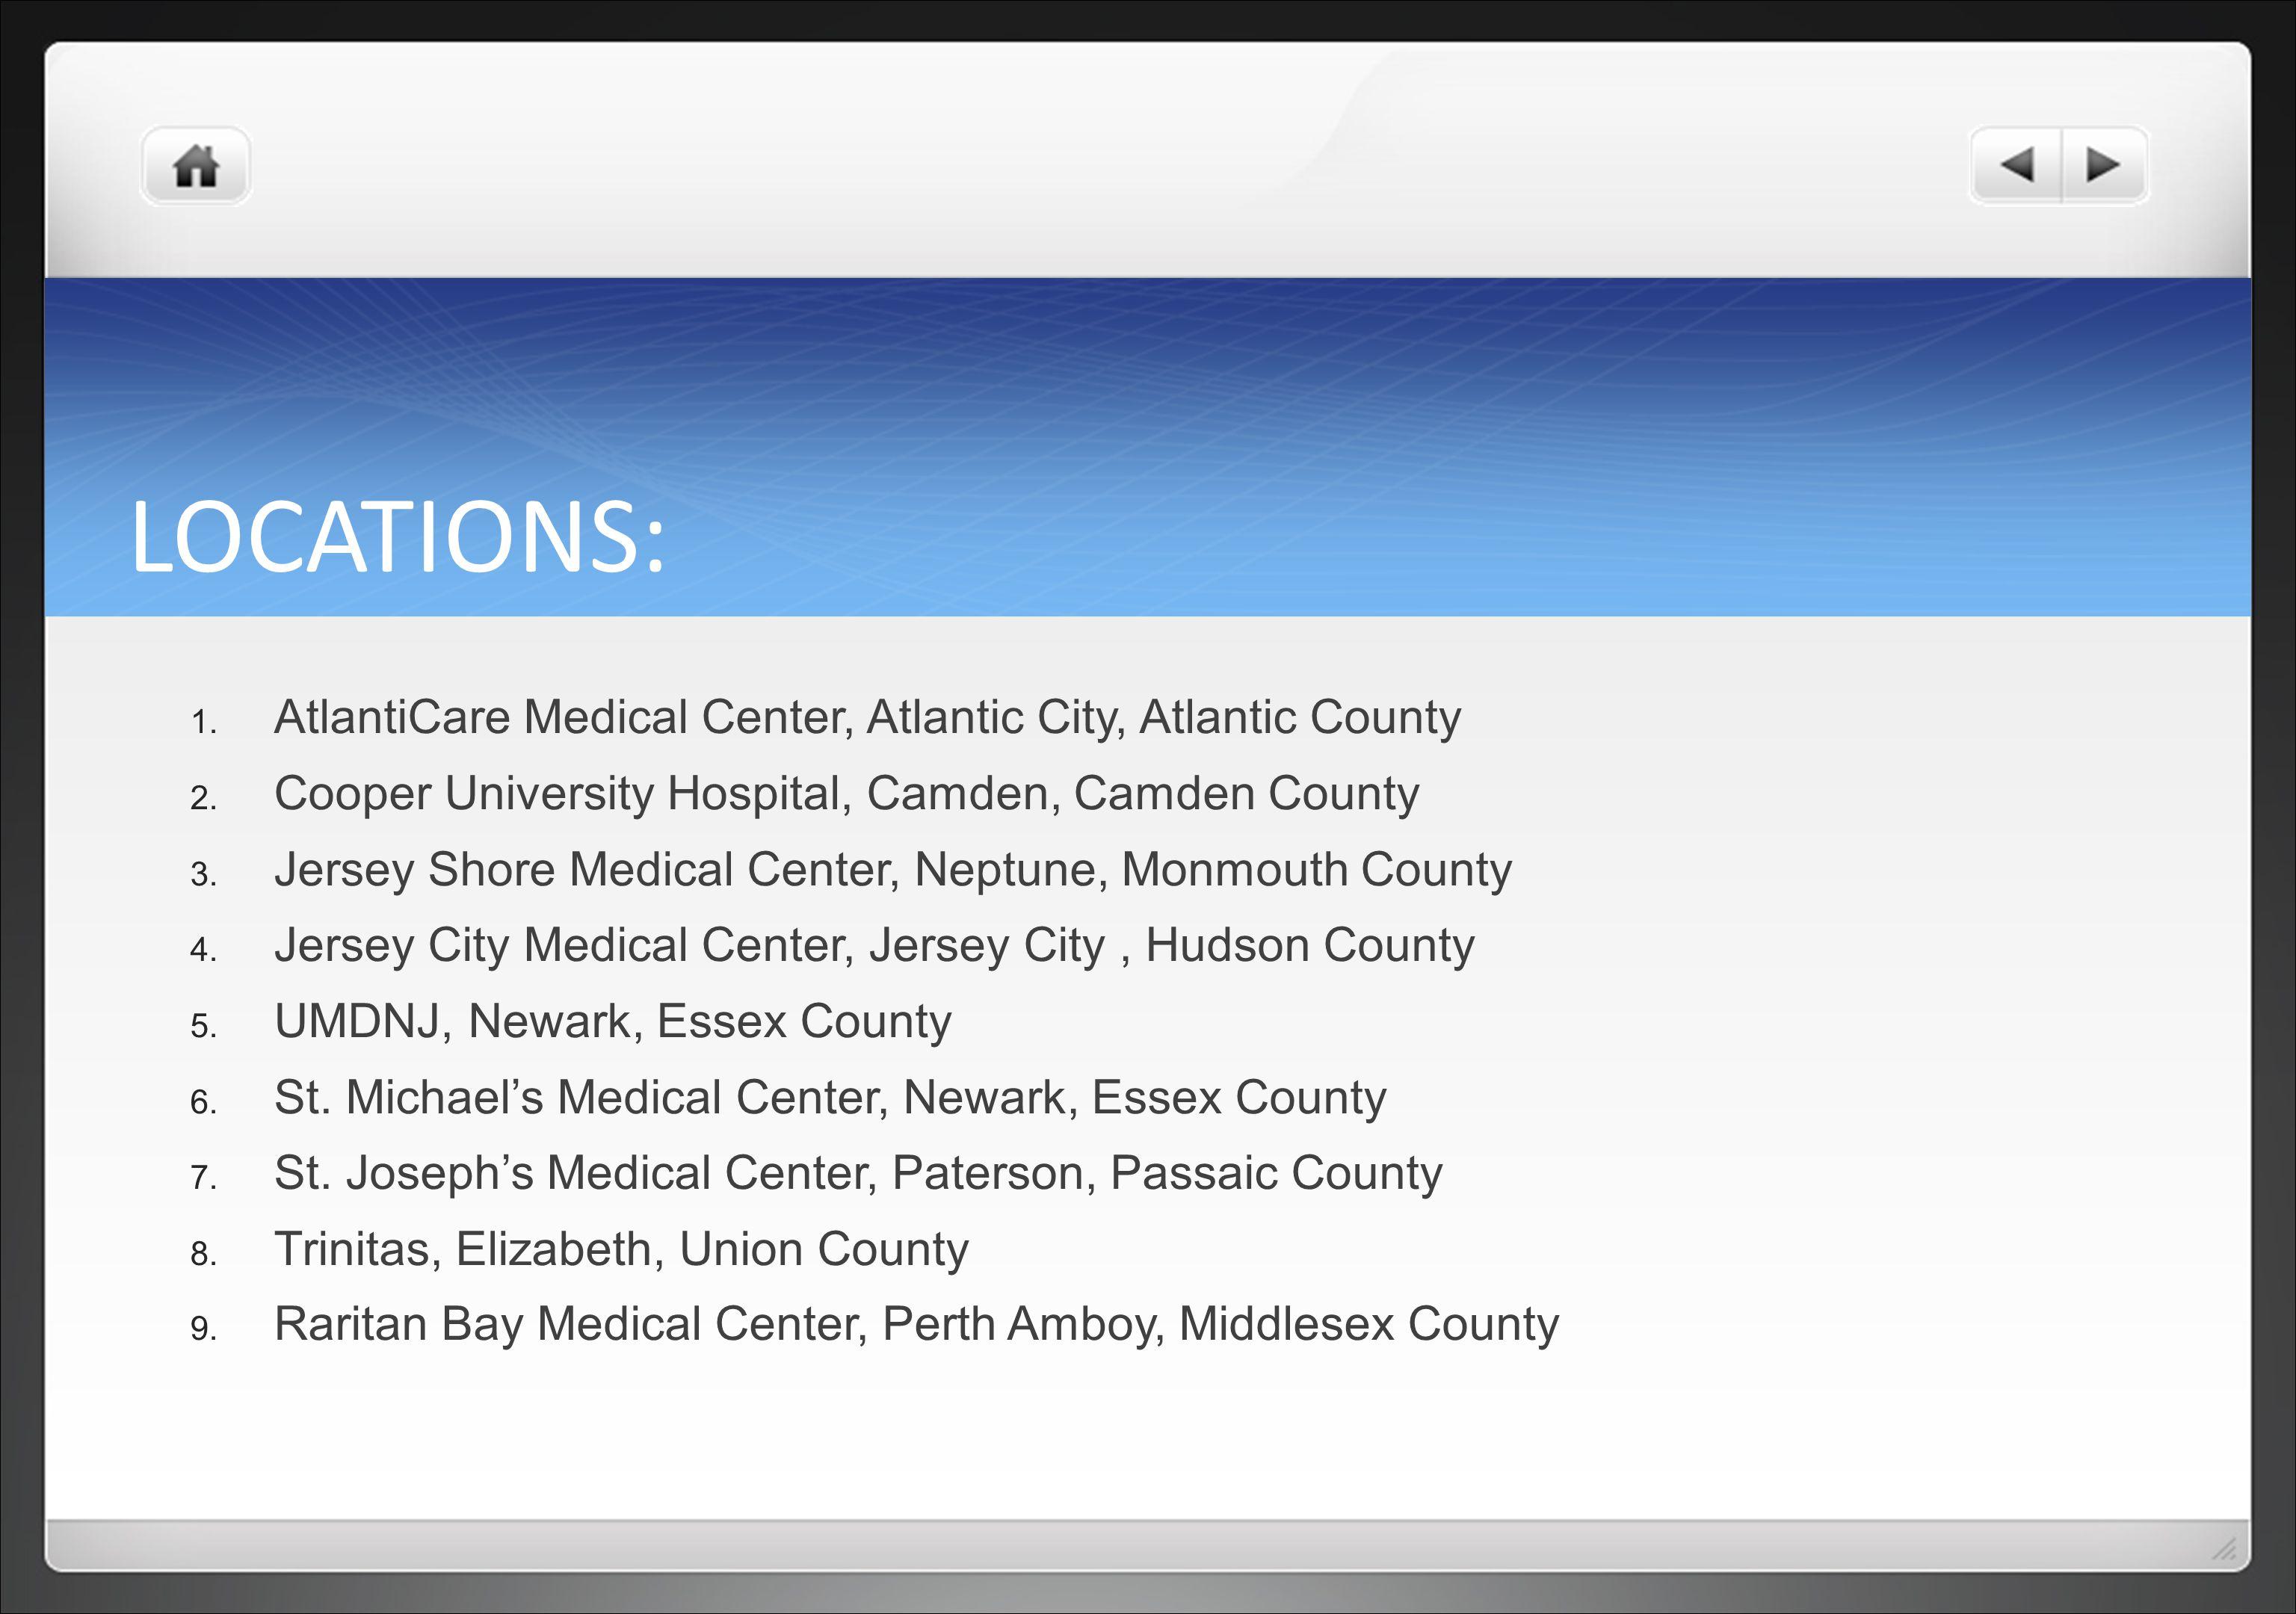 LOCATIONS: 1.AtlantiCare Medical Center, Atlantic City, Atlantic County 2.